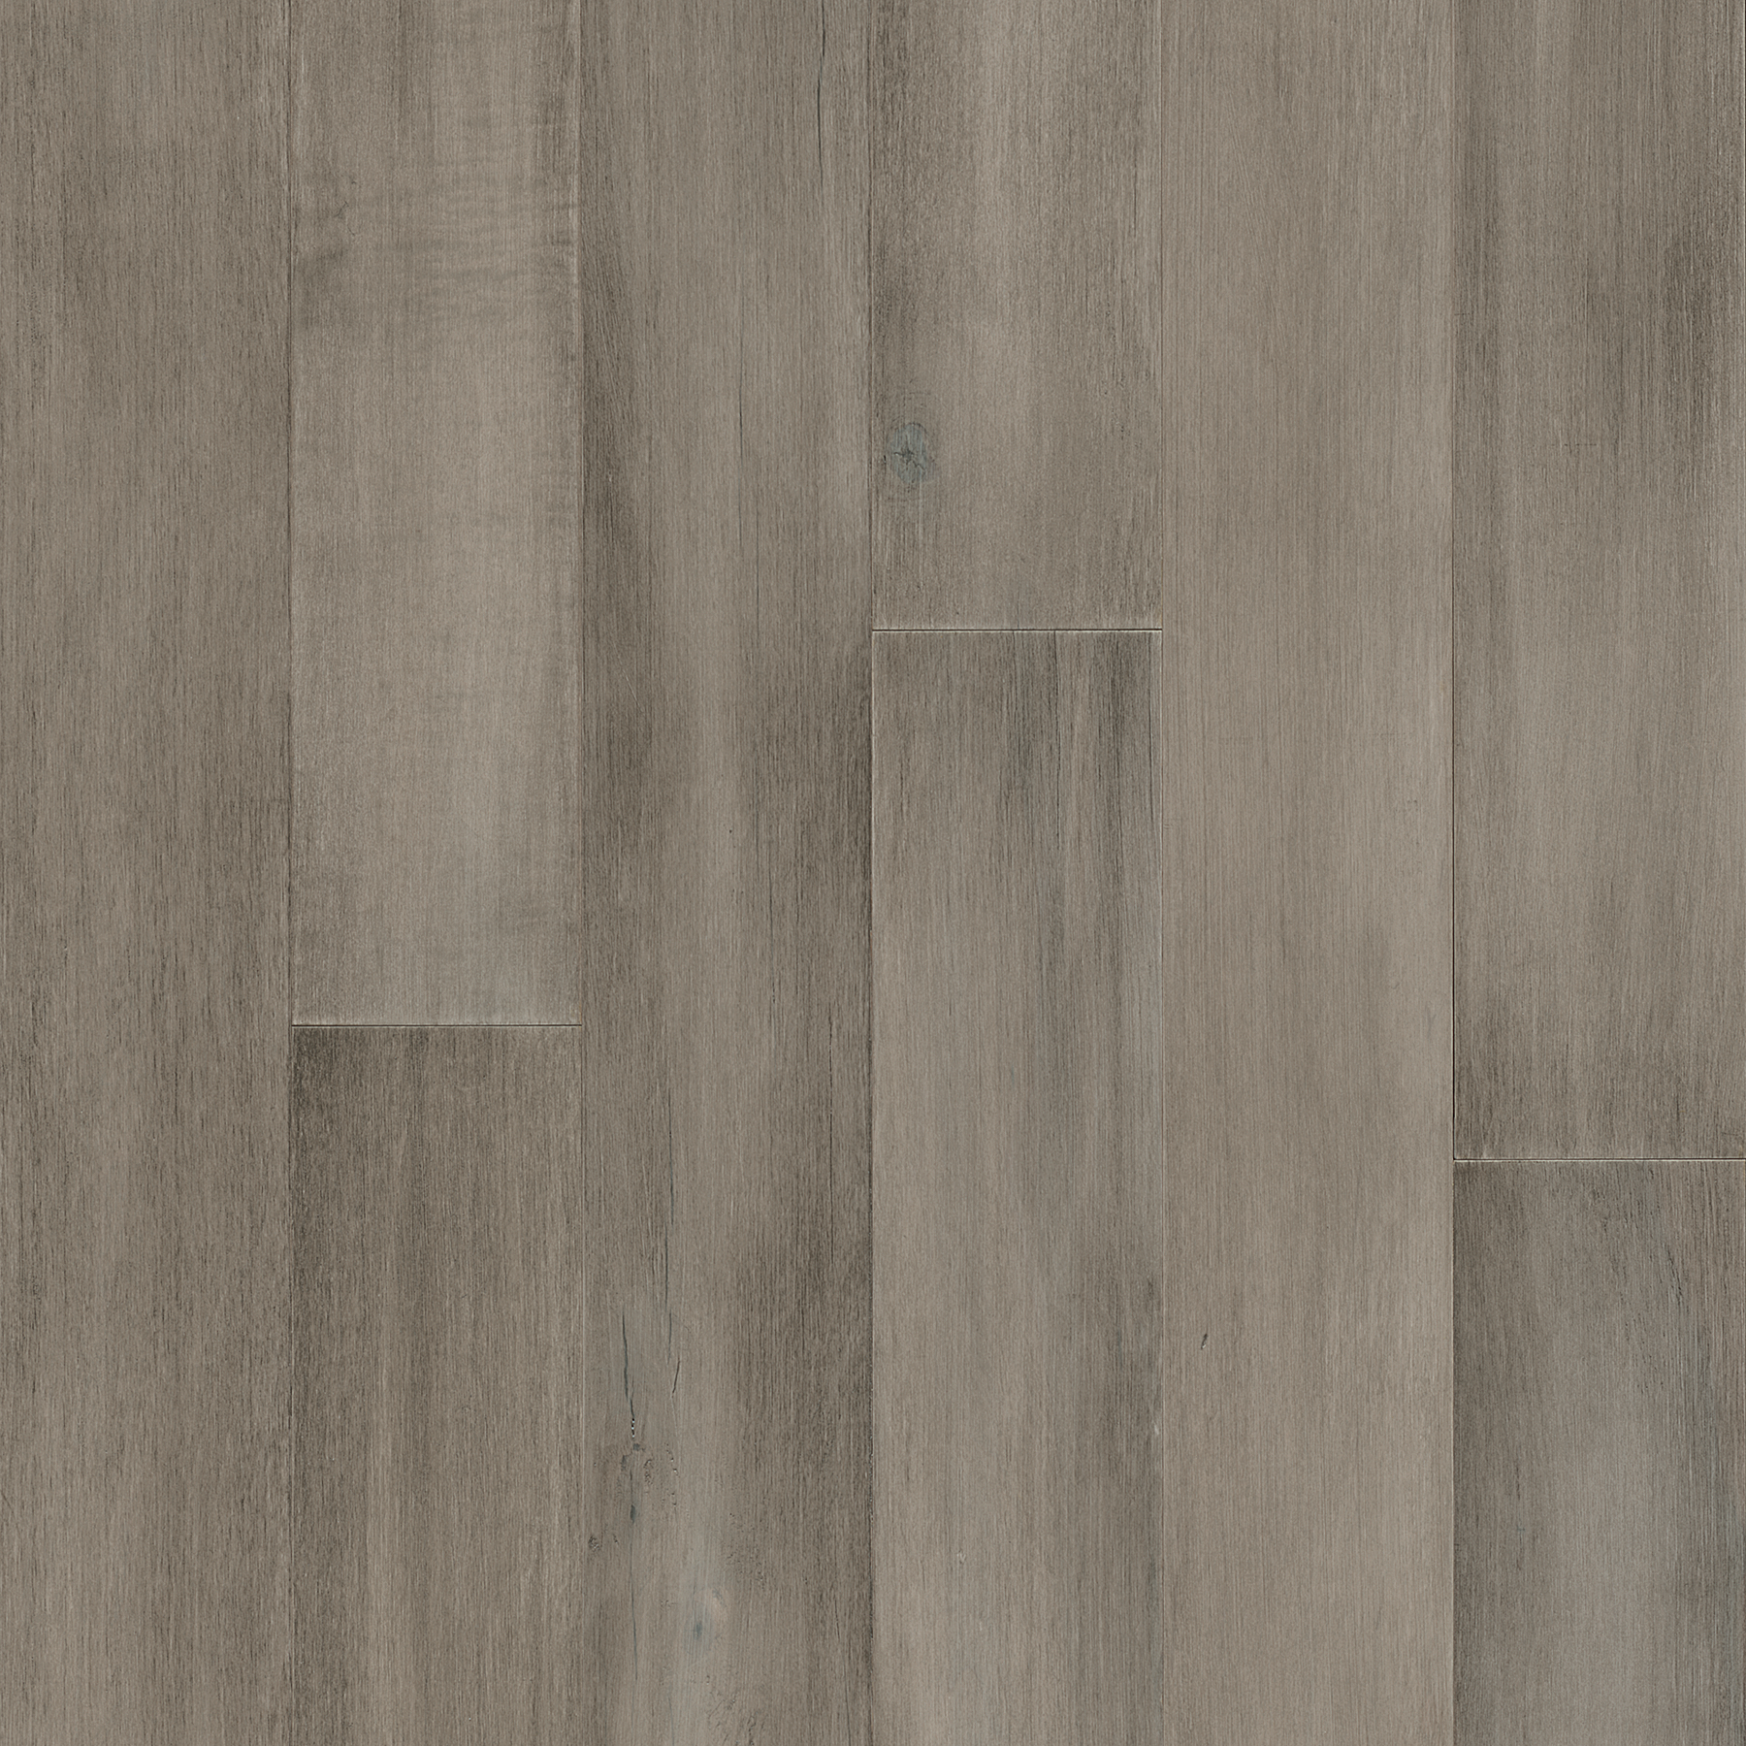 Engineered Wood Floor For Bathroom In 2020 Engineered Hardwood Flooring Hardwood Floors Engineered Hardwood